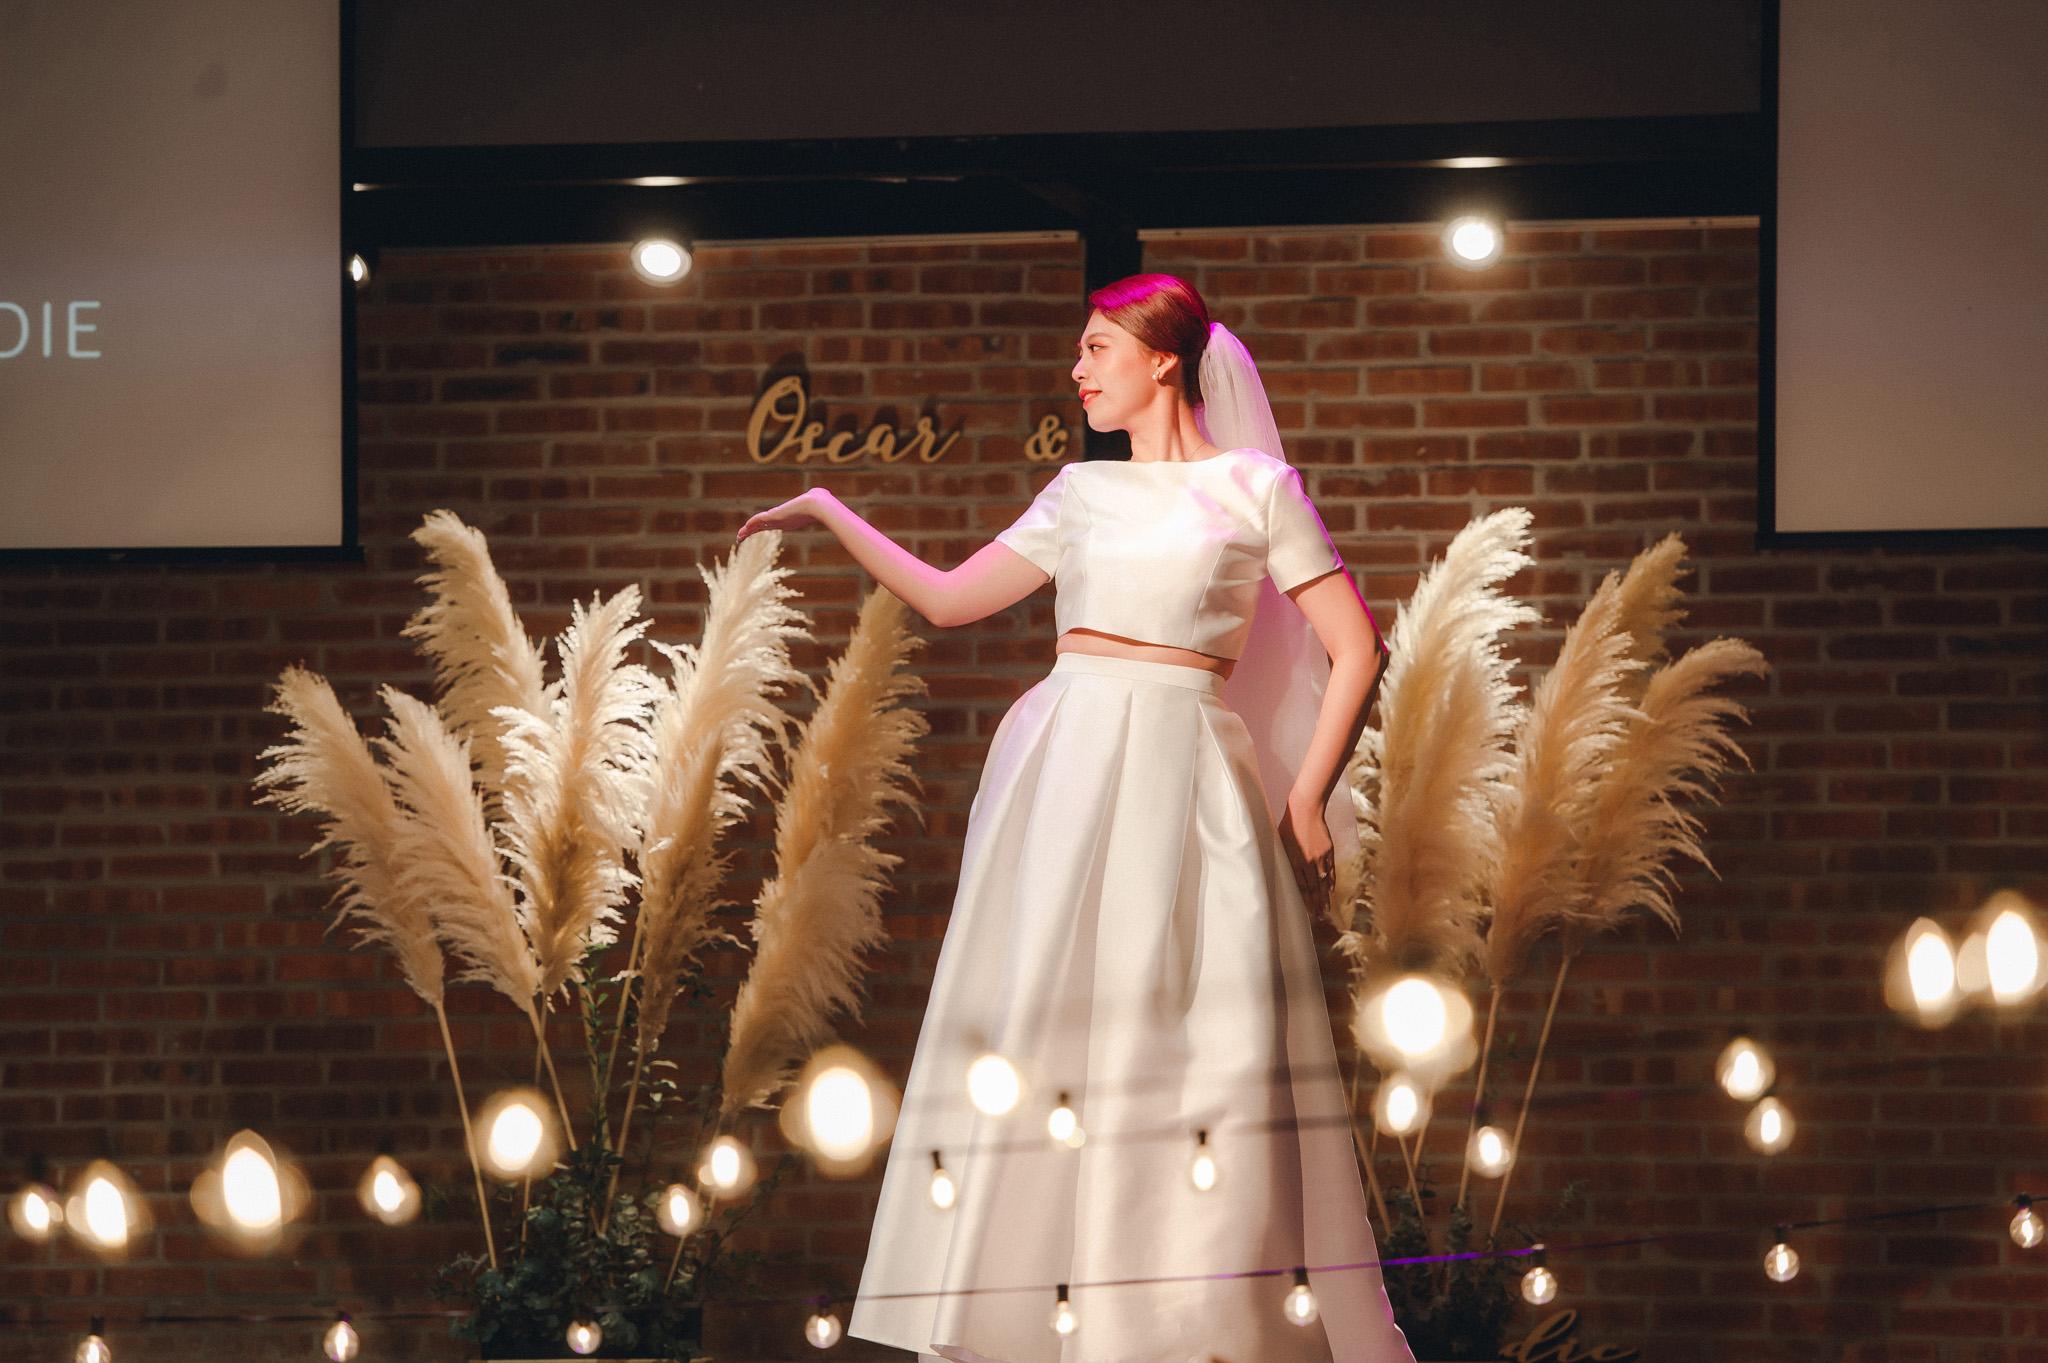 EW 台北婚攝 居米 濟南教會 Brick Yard 33 美軍俱樂部 婚禮 婚宴-72